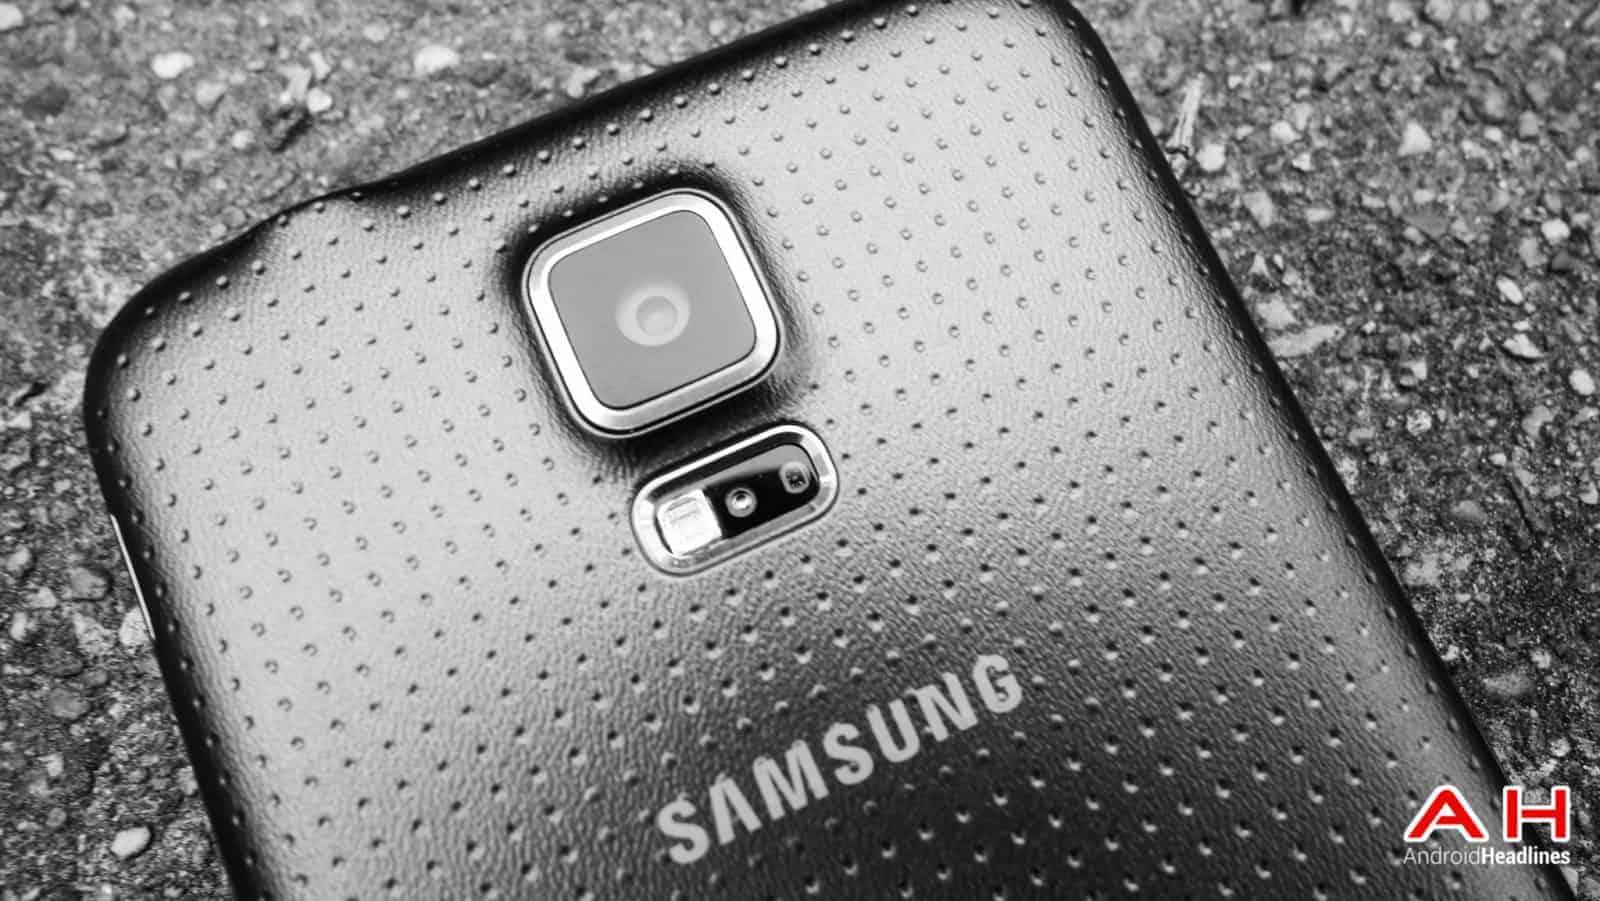 Samsung-galaxy-s5-ah-13-2